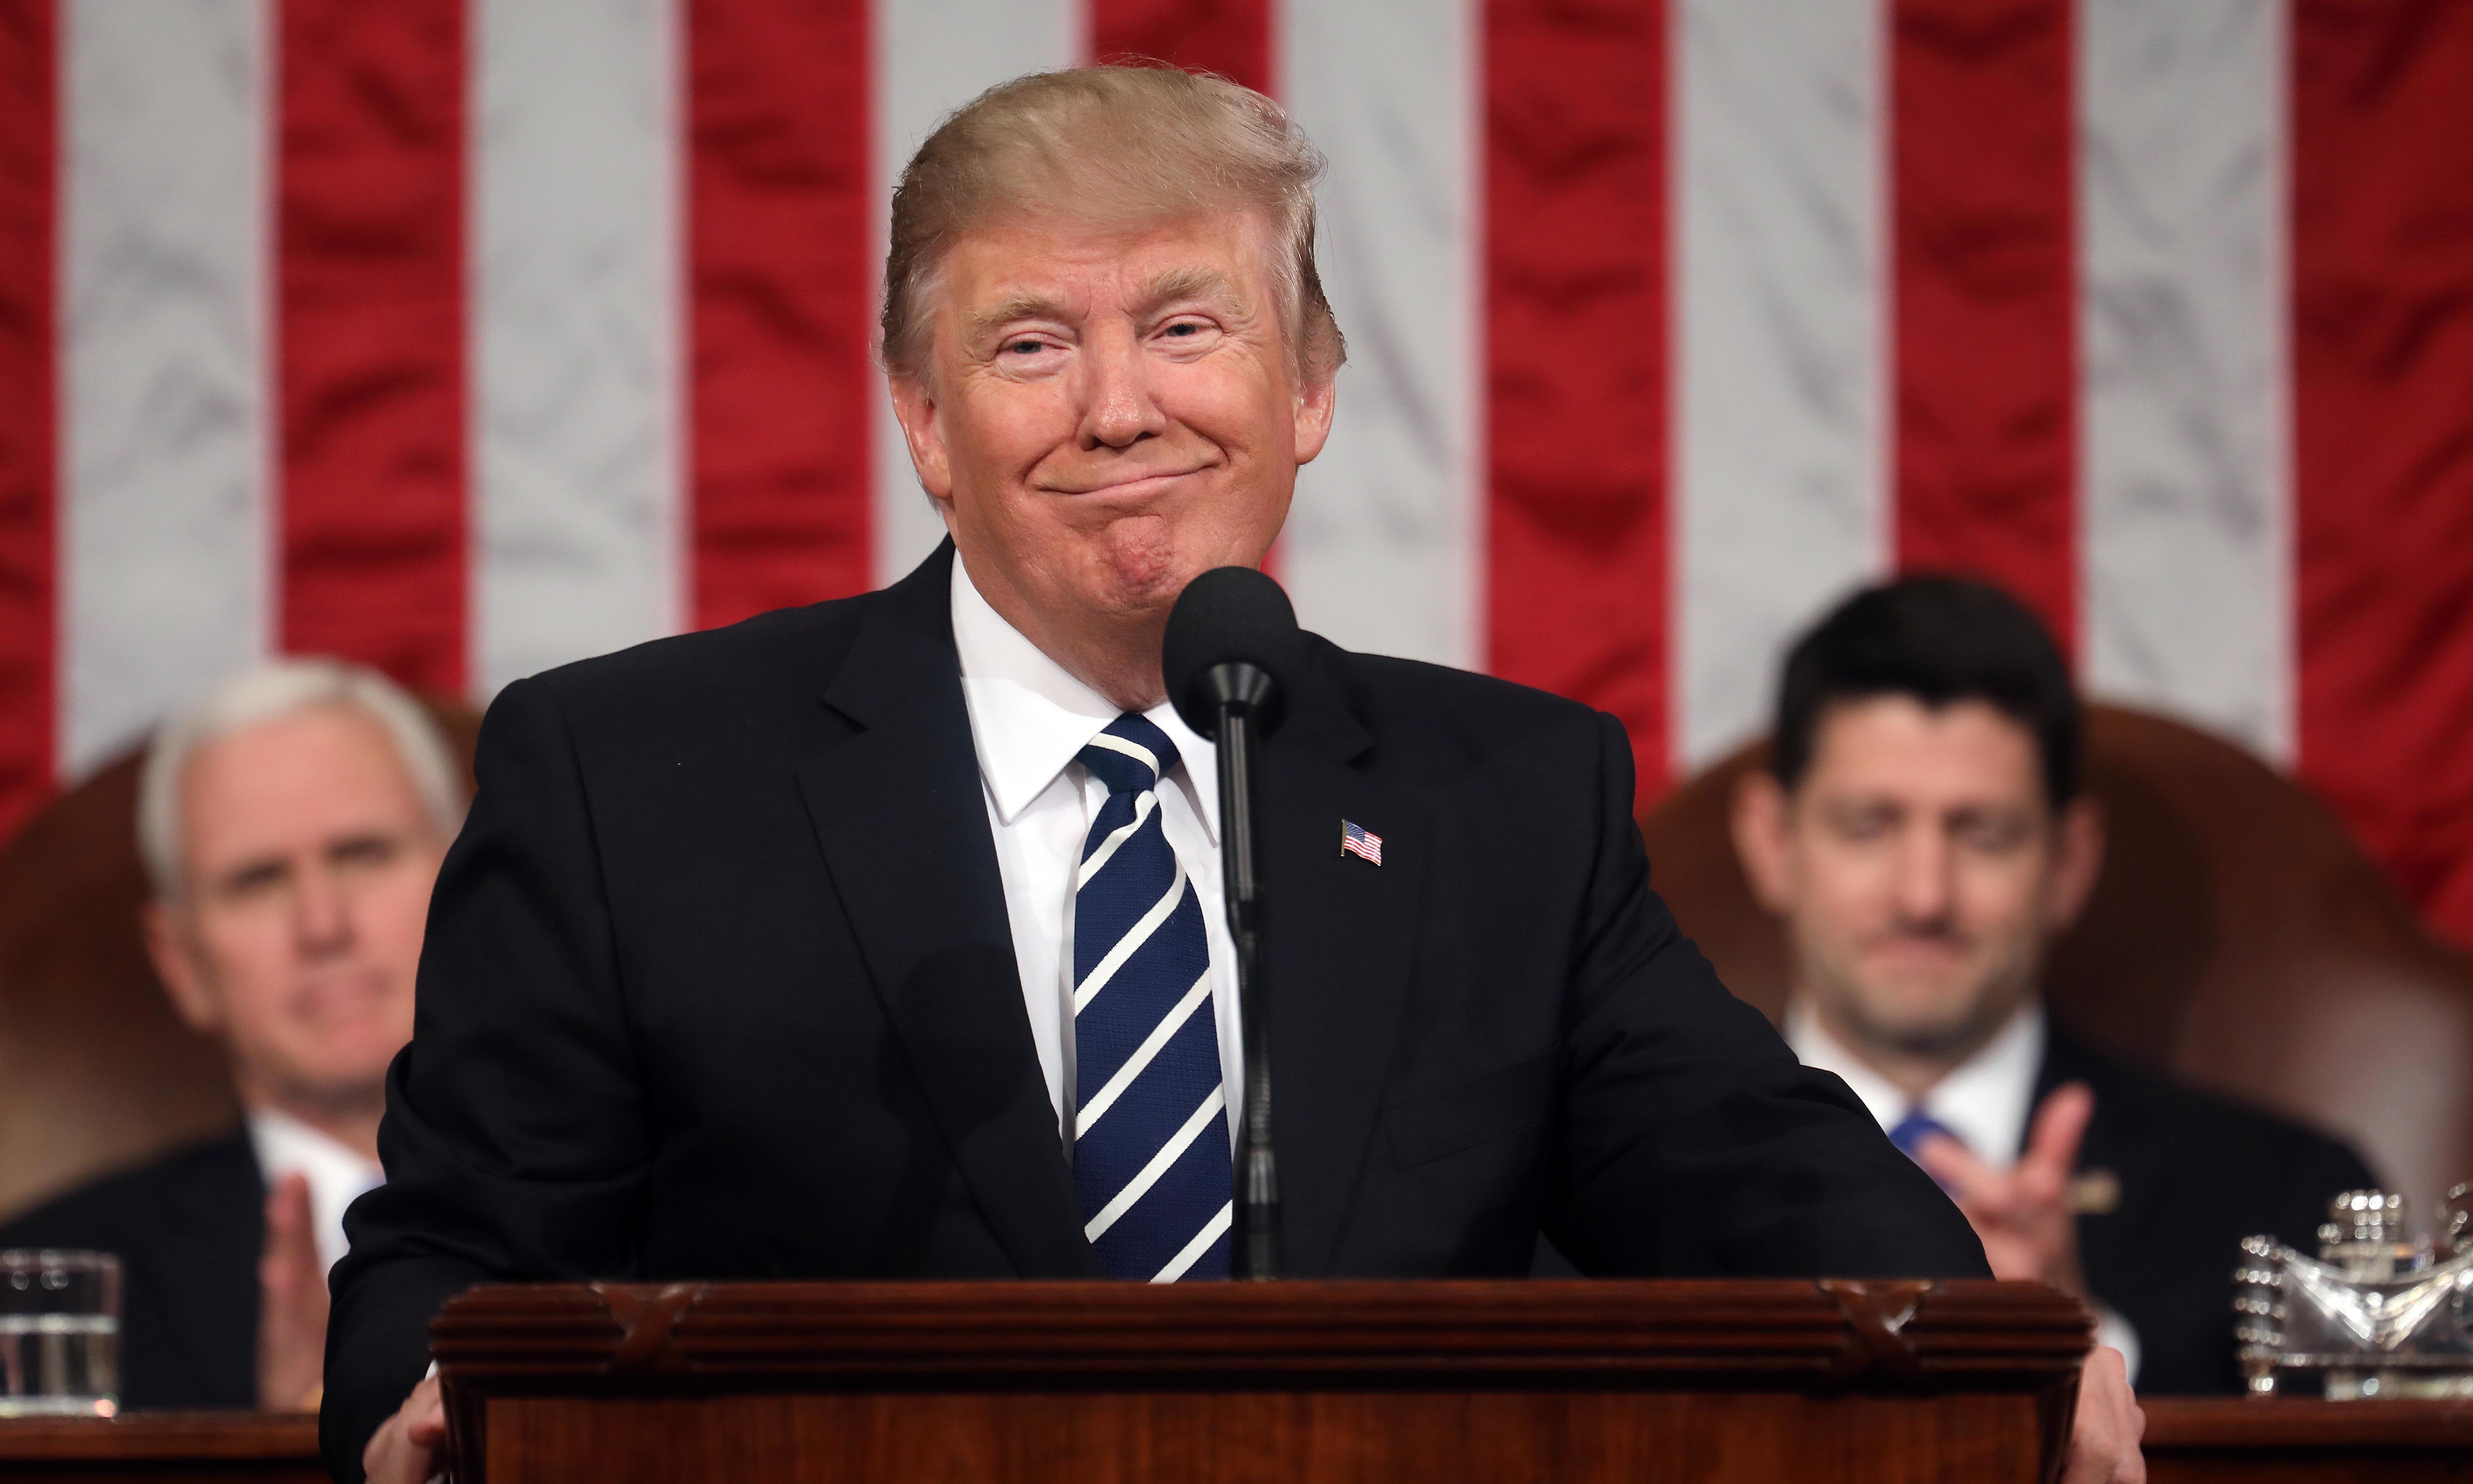 California representative calls President Trump's tweets at LaVar Ball racially charged